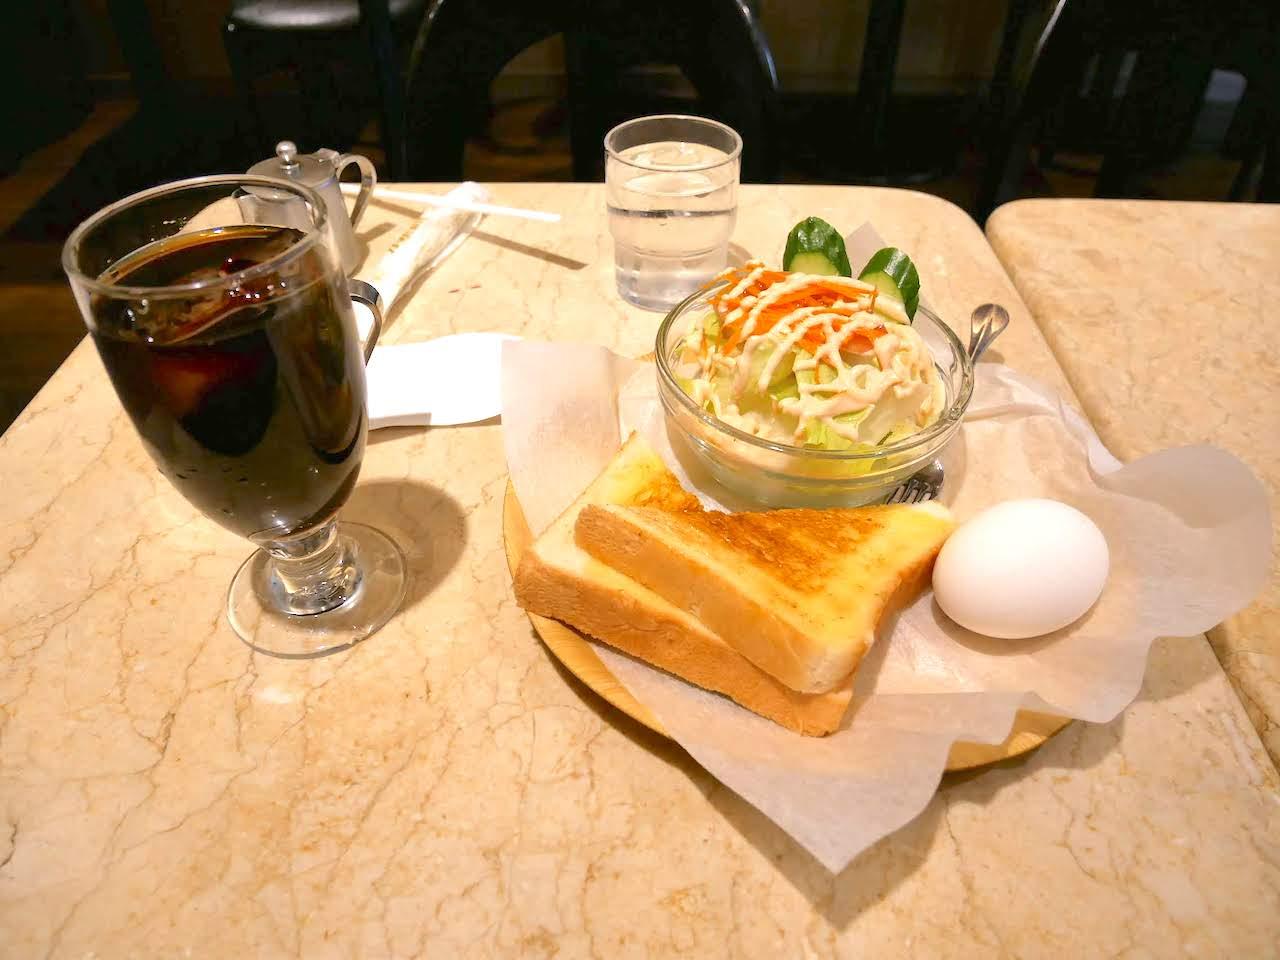 http://morning.tokyo-review.com/images/1150779.jpg